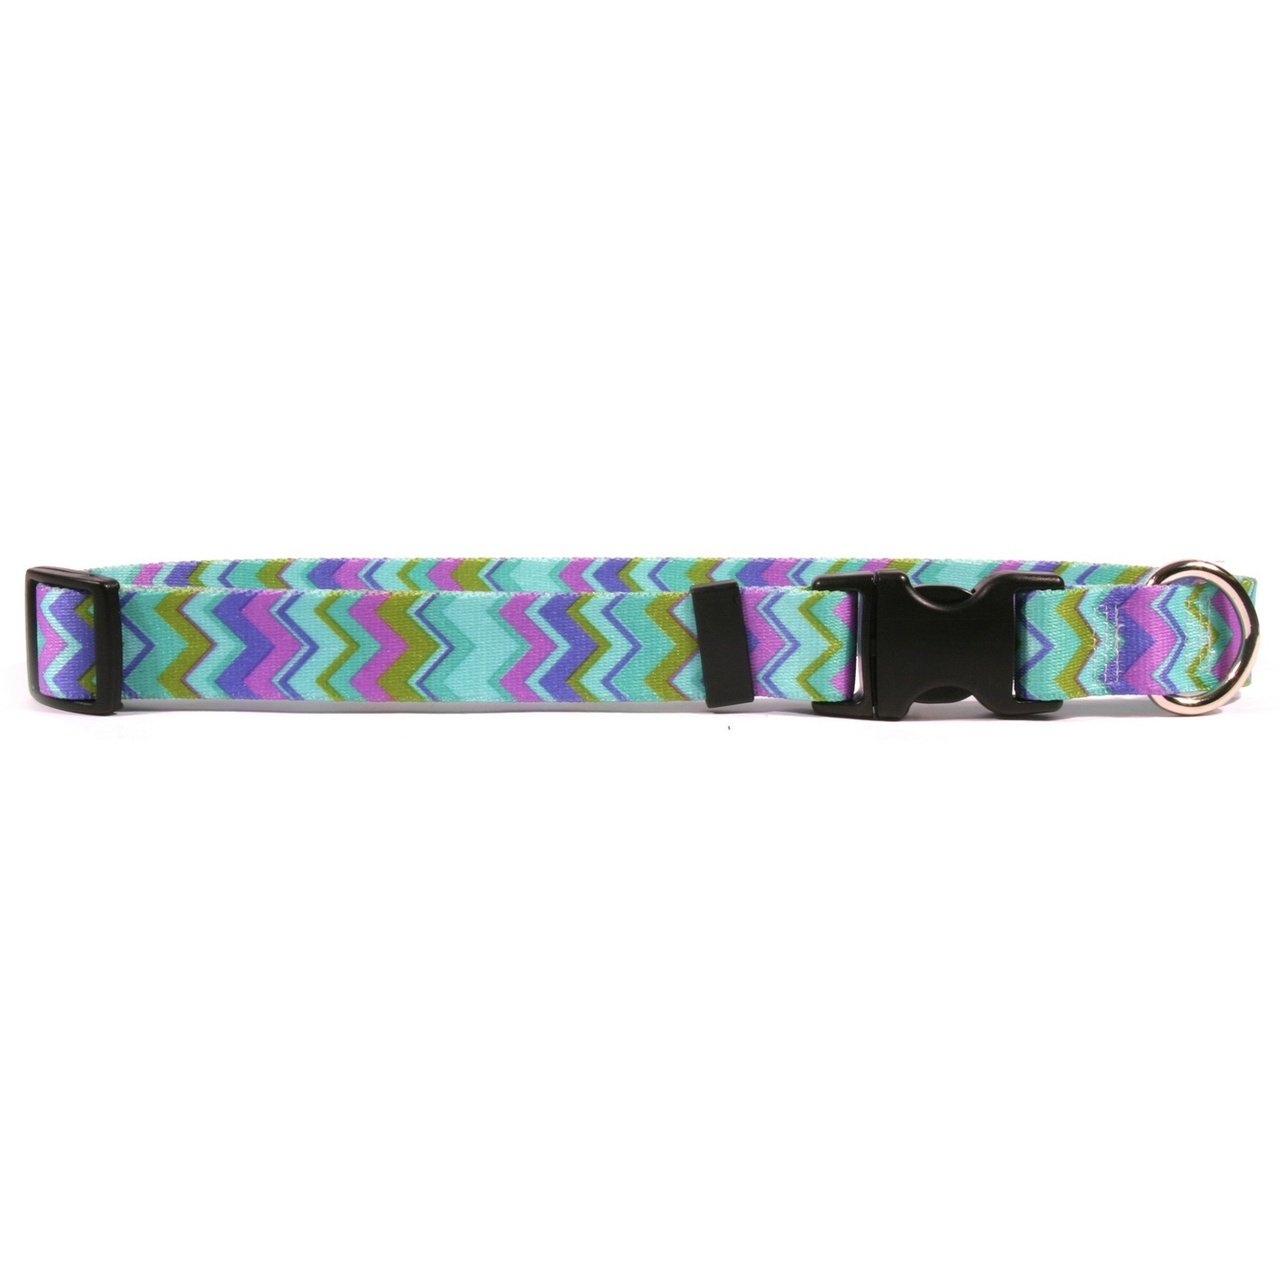 Yellow Dog Design Chevy Stripe bluee Dog Collar Fits Neck 14 To 20  4  Wide, Medium 3 4  Wide